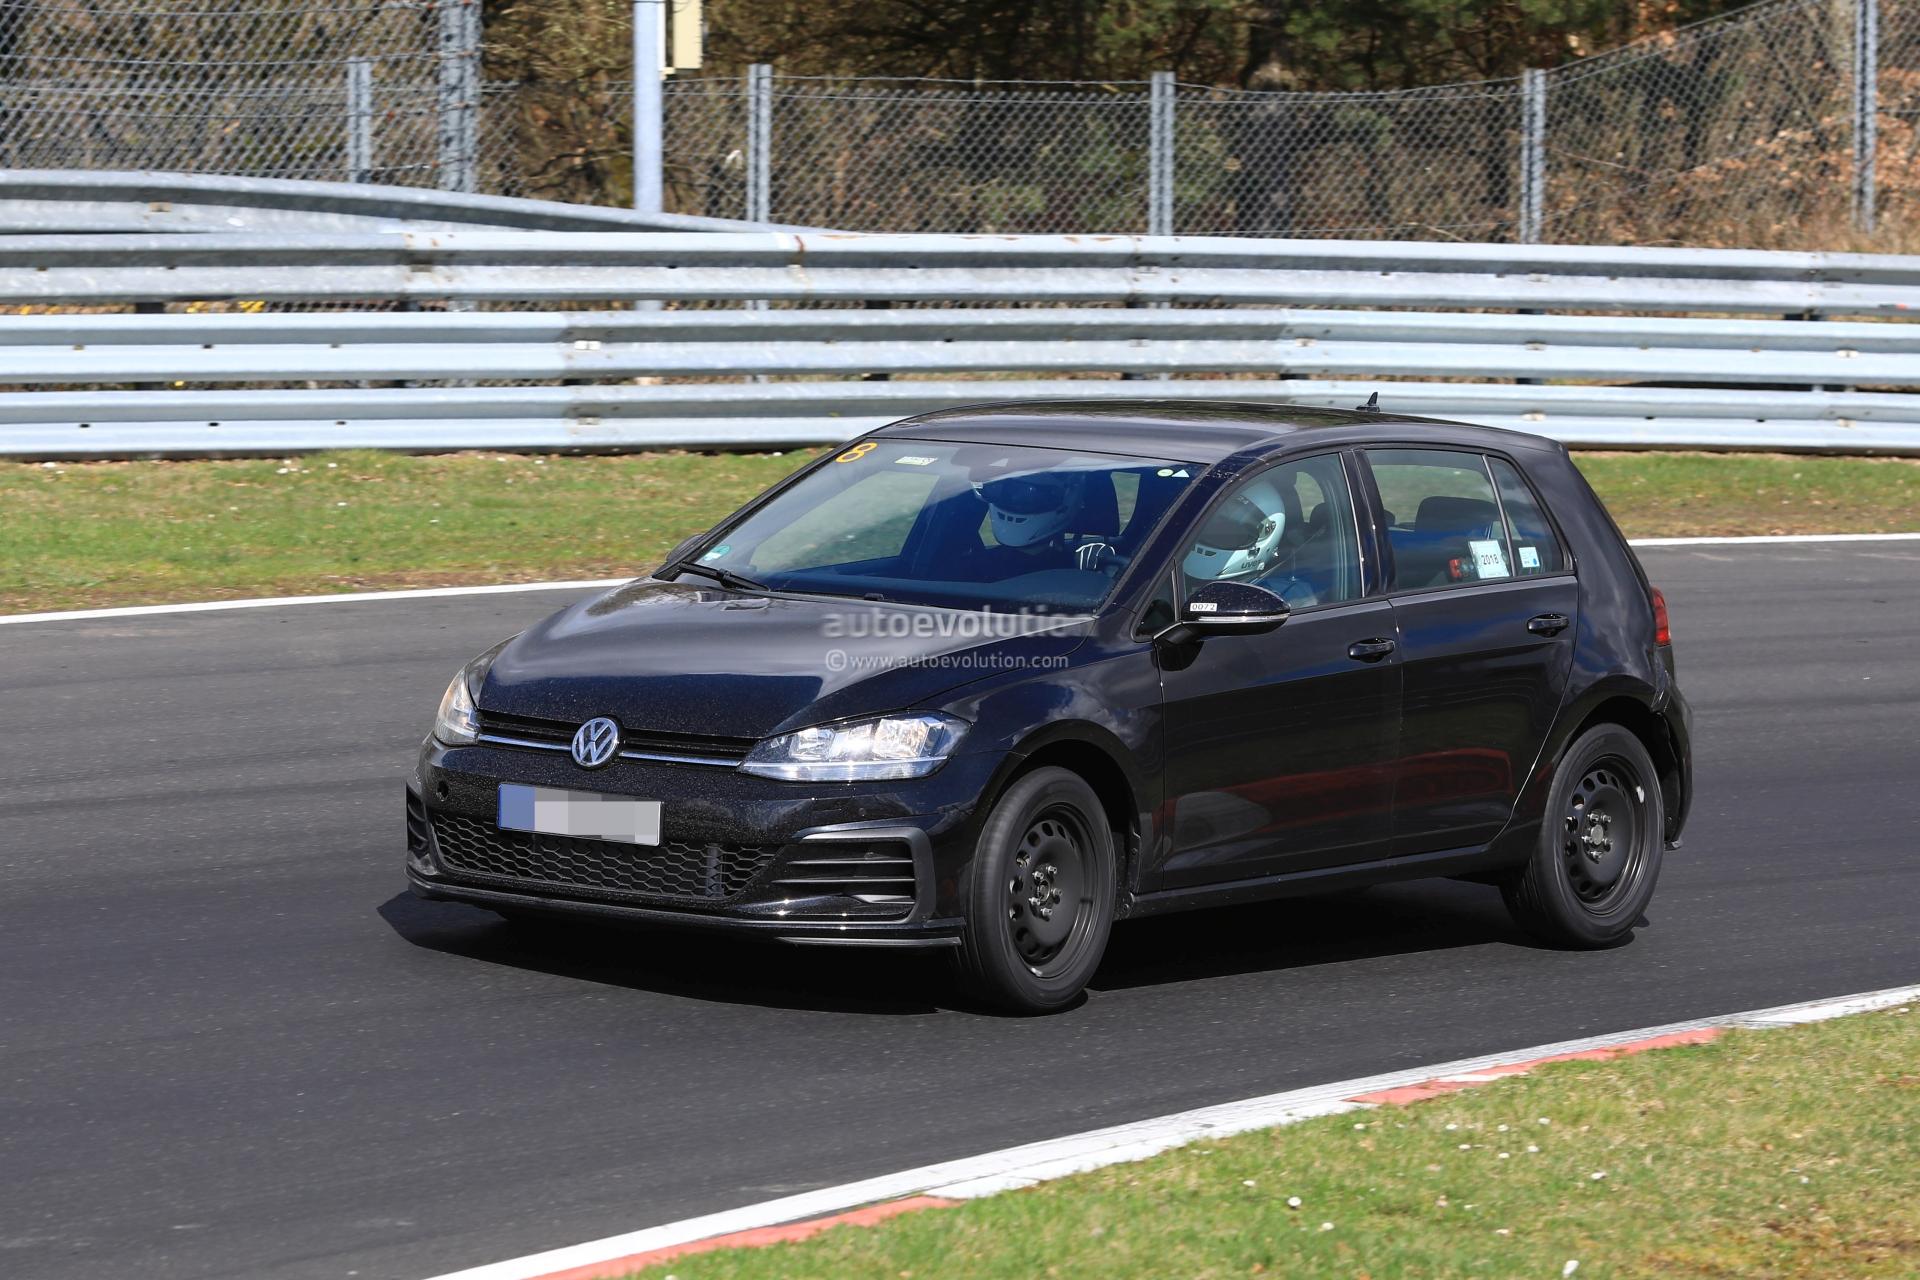 spyshots volkswagen golf 8 hits nurburgring shows new. Black Bedroom Furniture Sets. Home Design Ideas